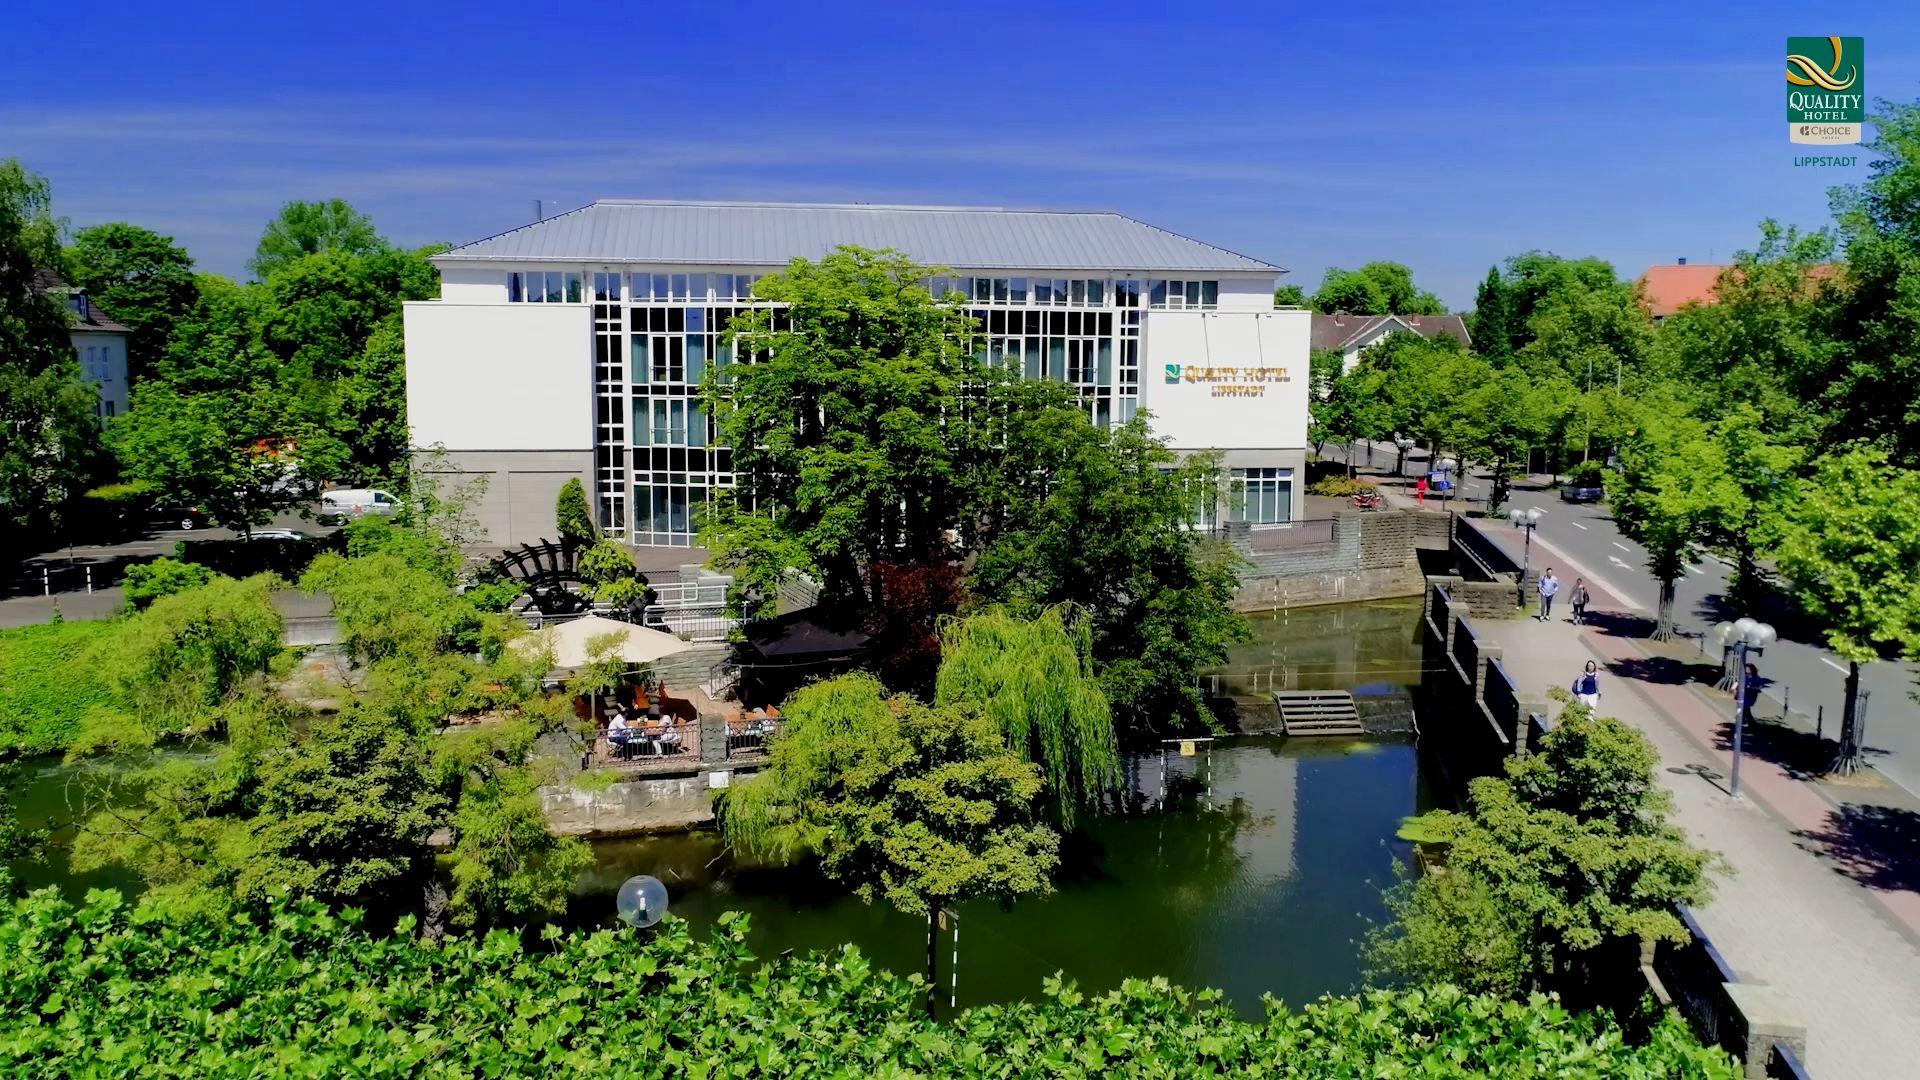 Quality Hotel Lippstadt